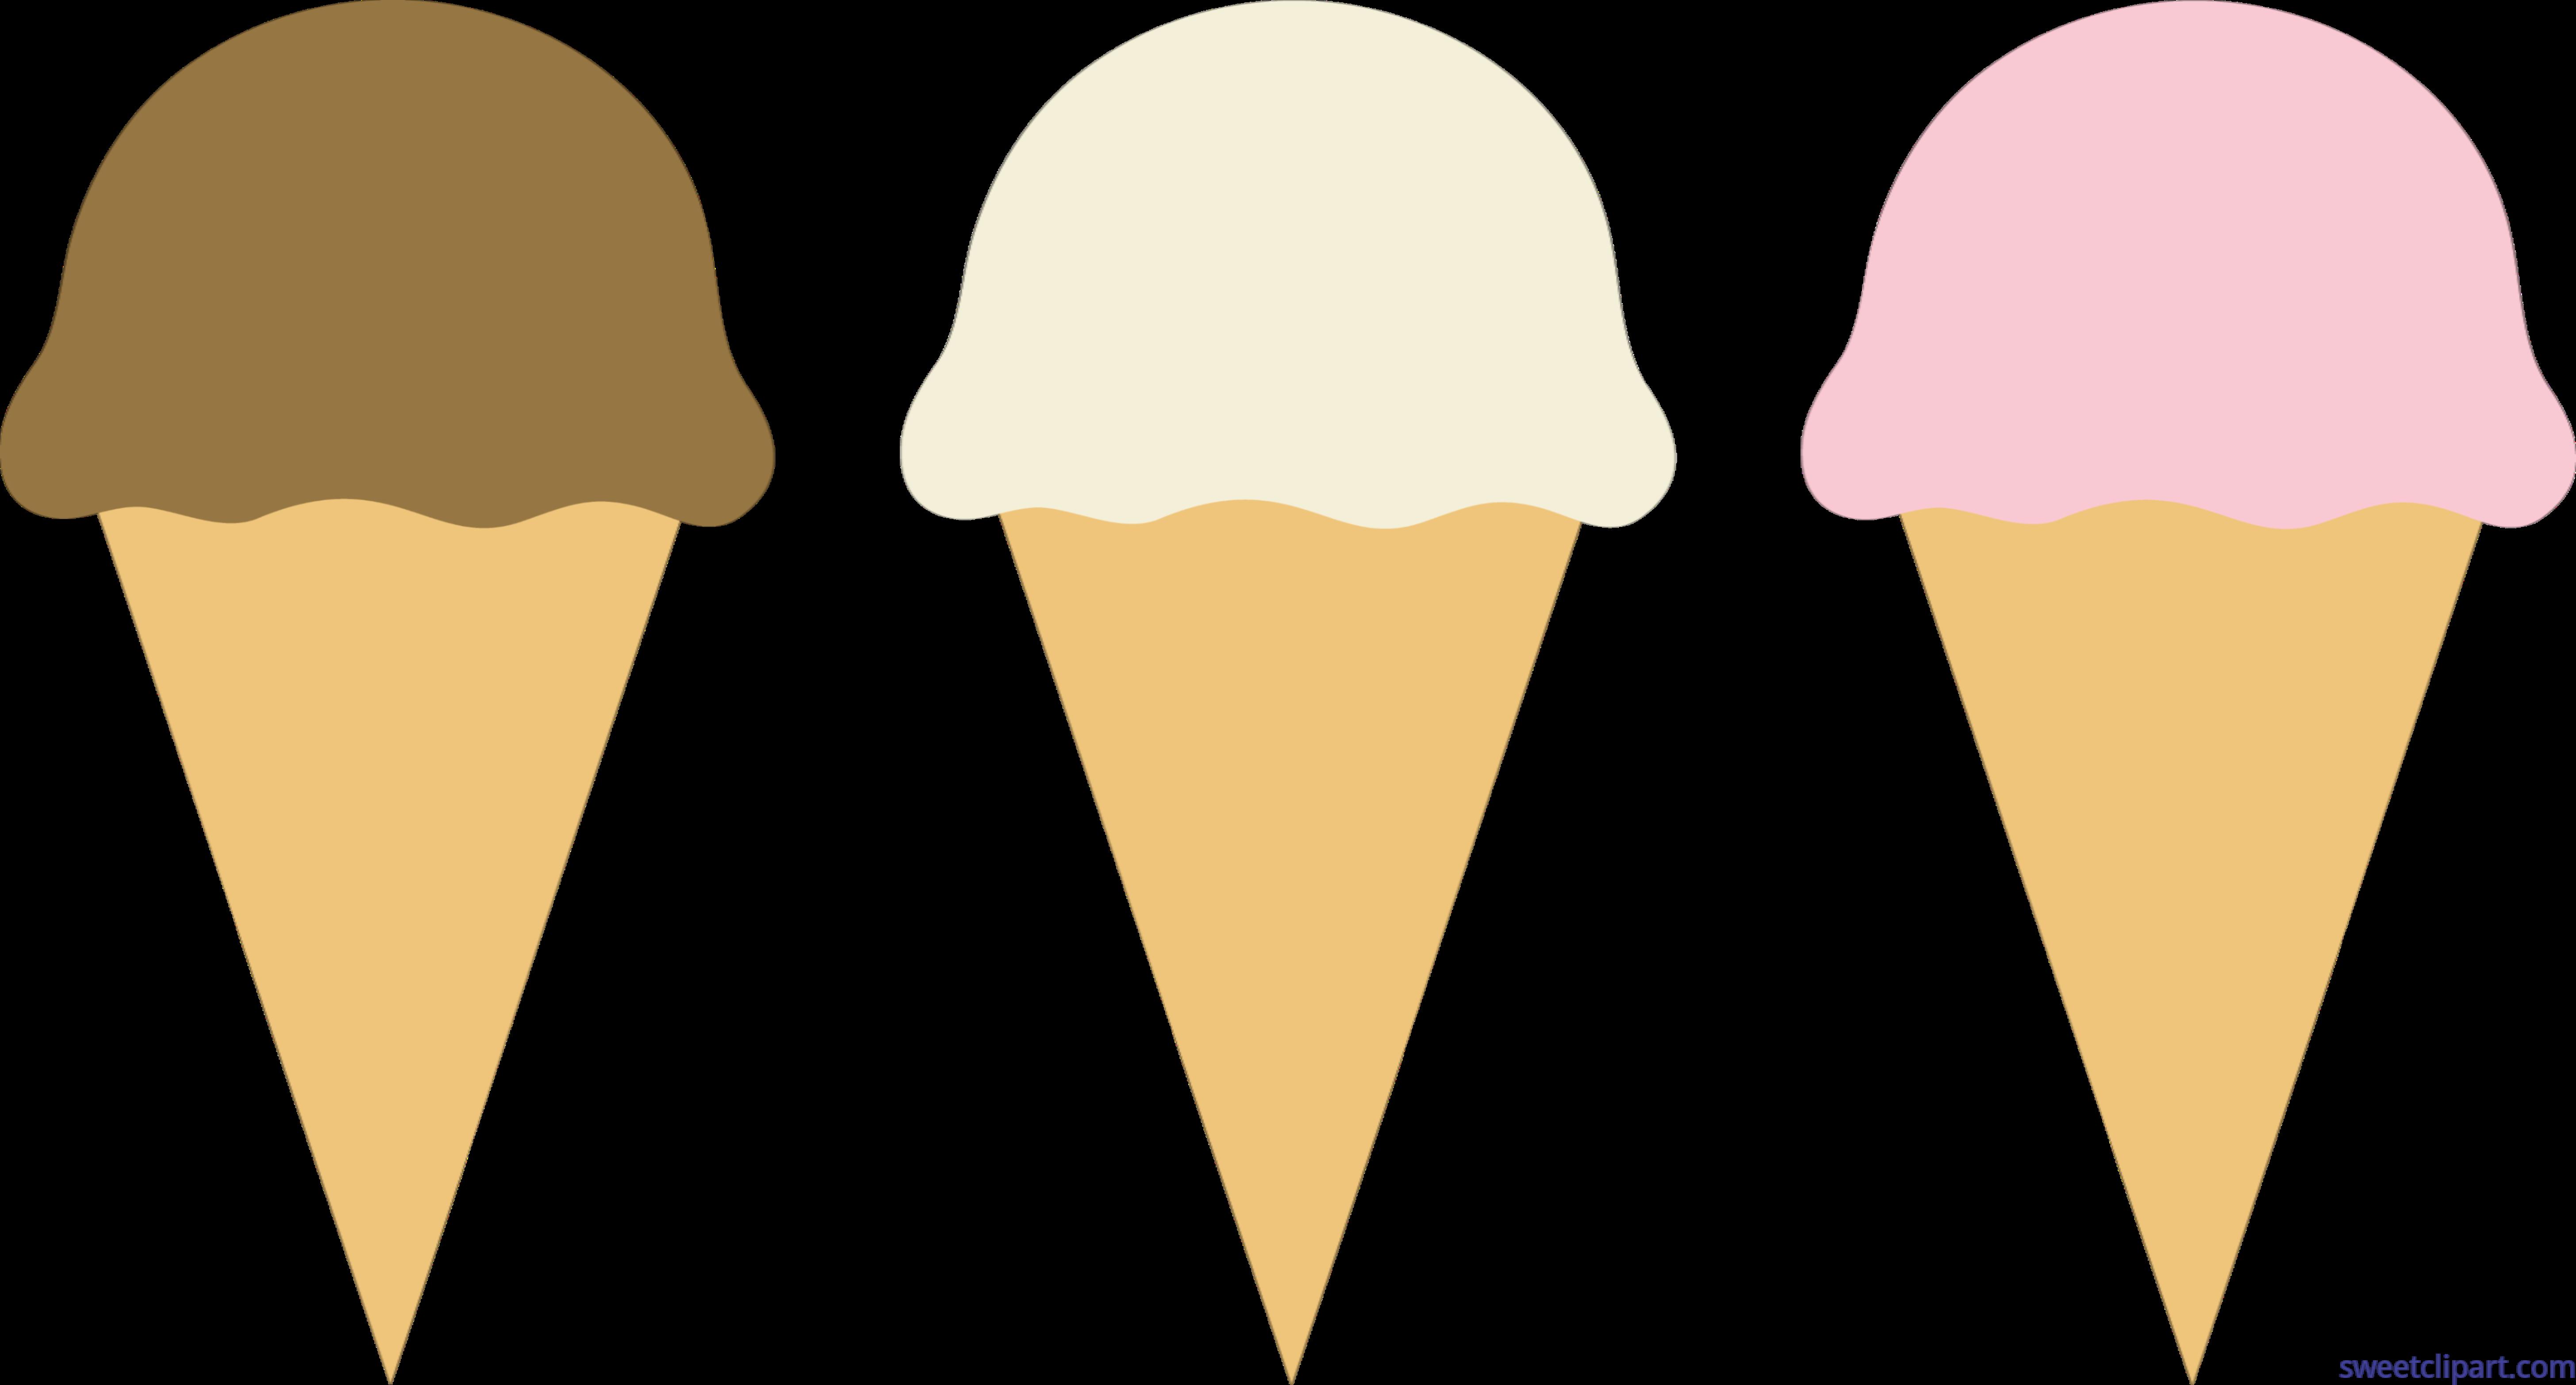 5823x3130 Ice Cream Cones Chocolate Vanilla Strawberry Clip Art